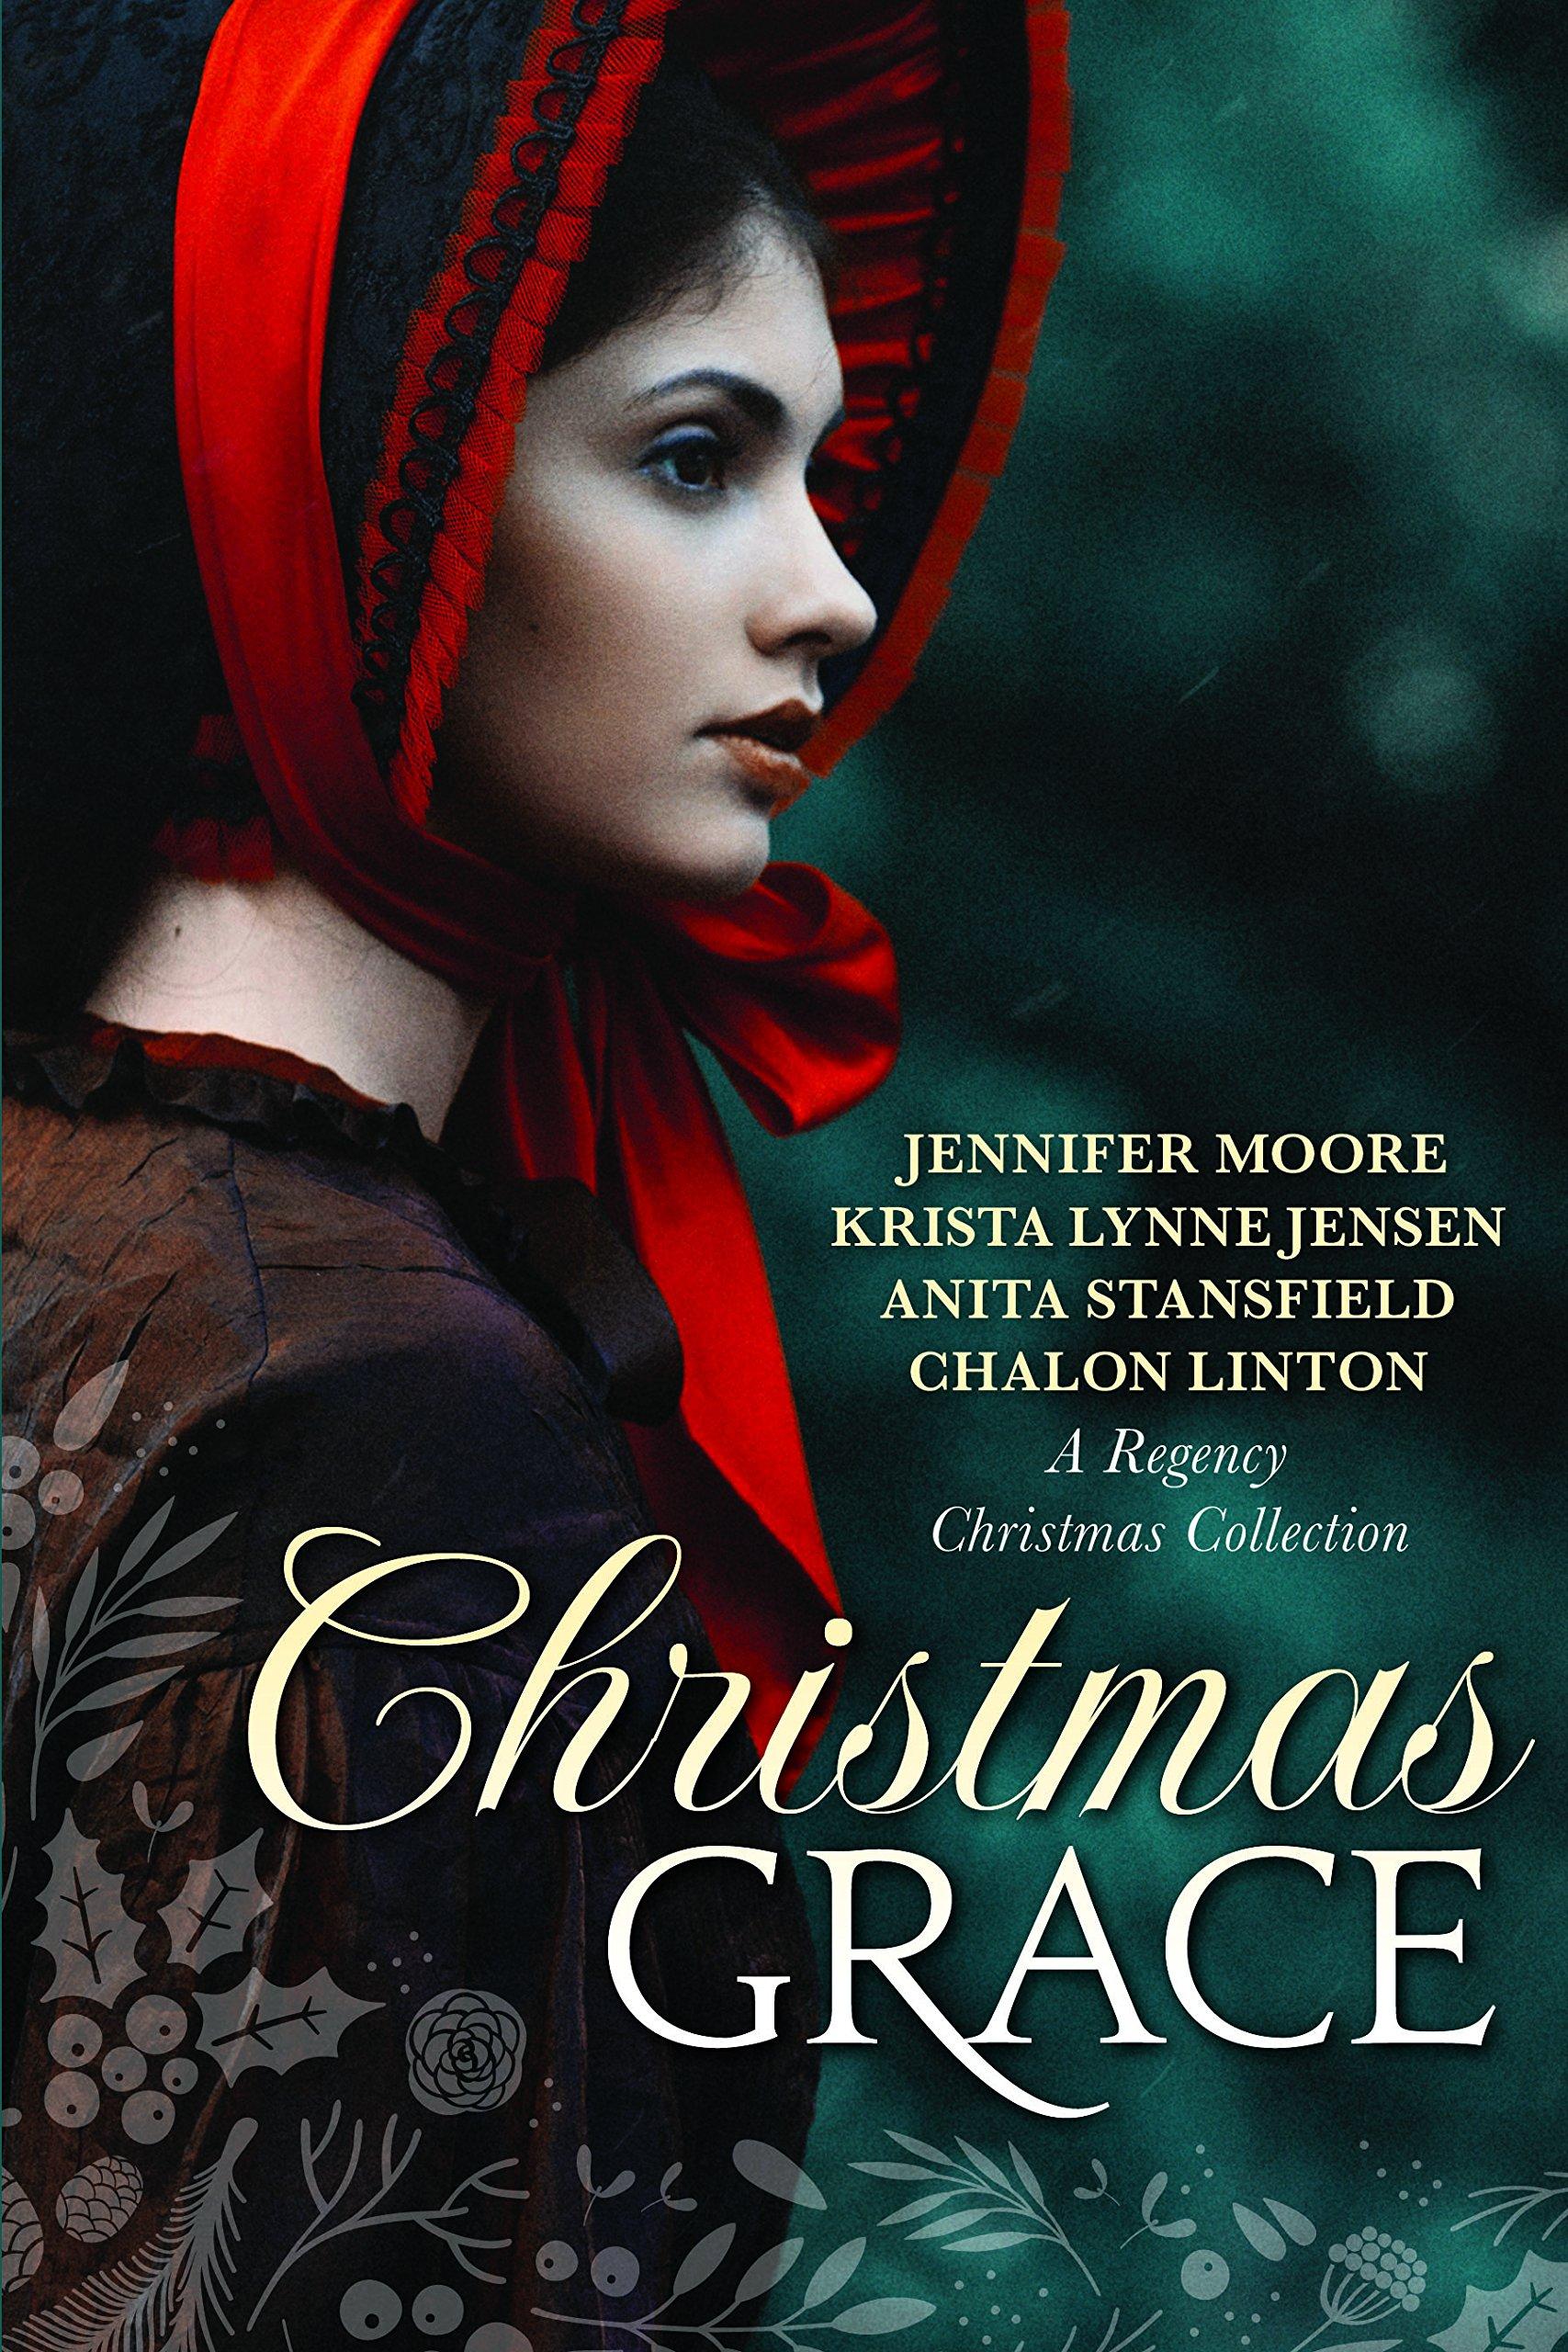 Christmas Grace.Christmas Grace Jennifer Moore Krista Lynne Jensen Anita